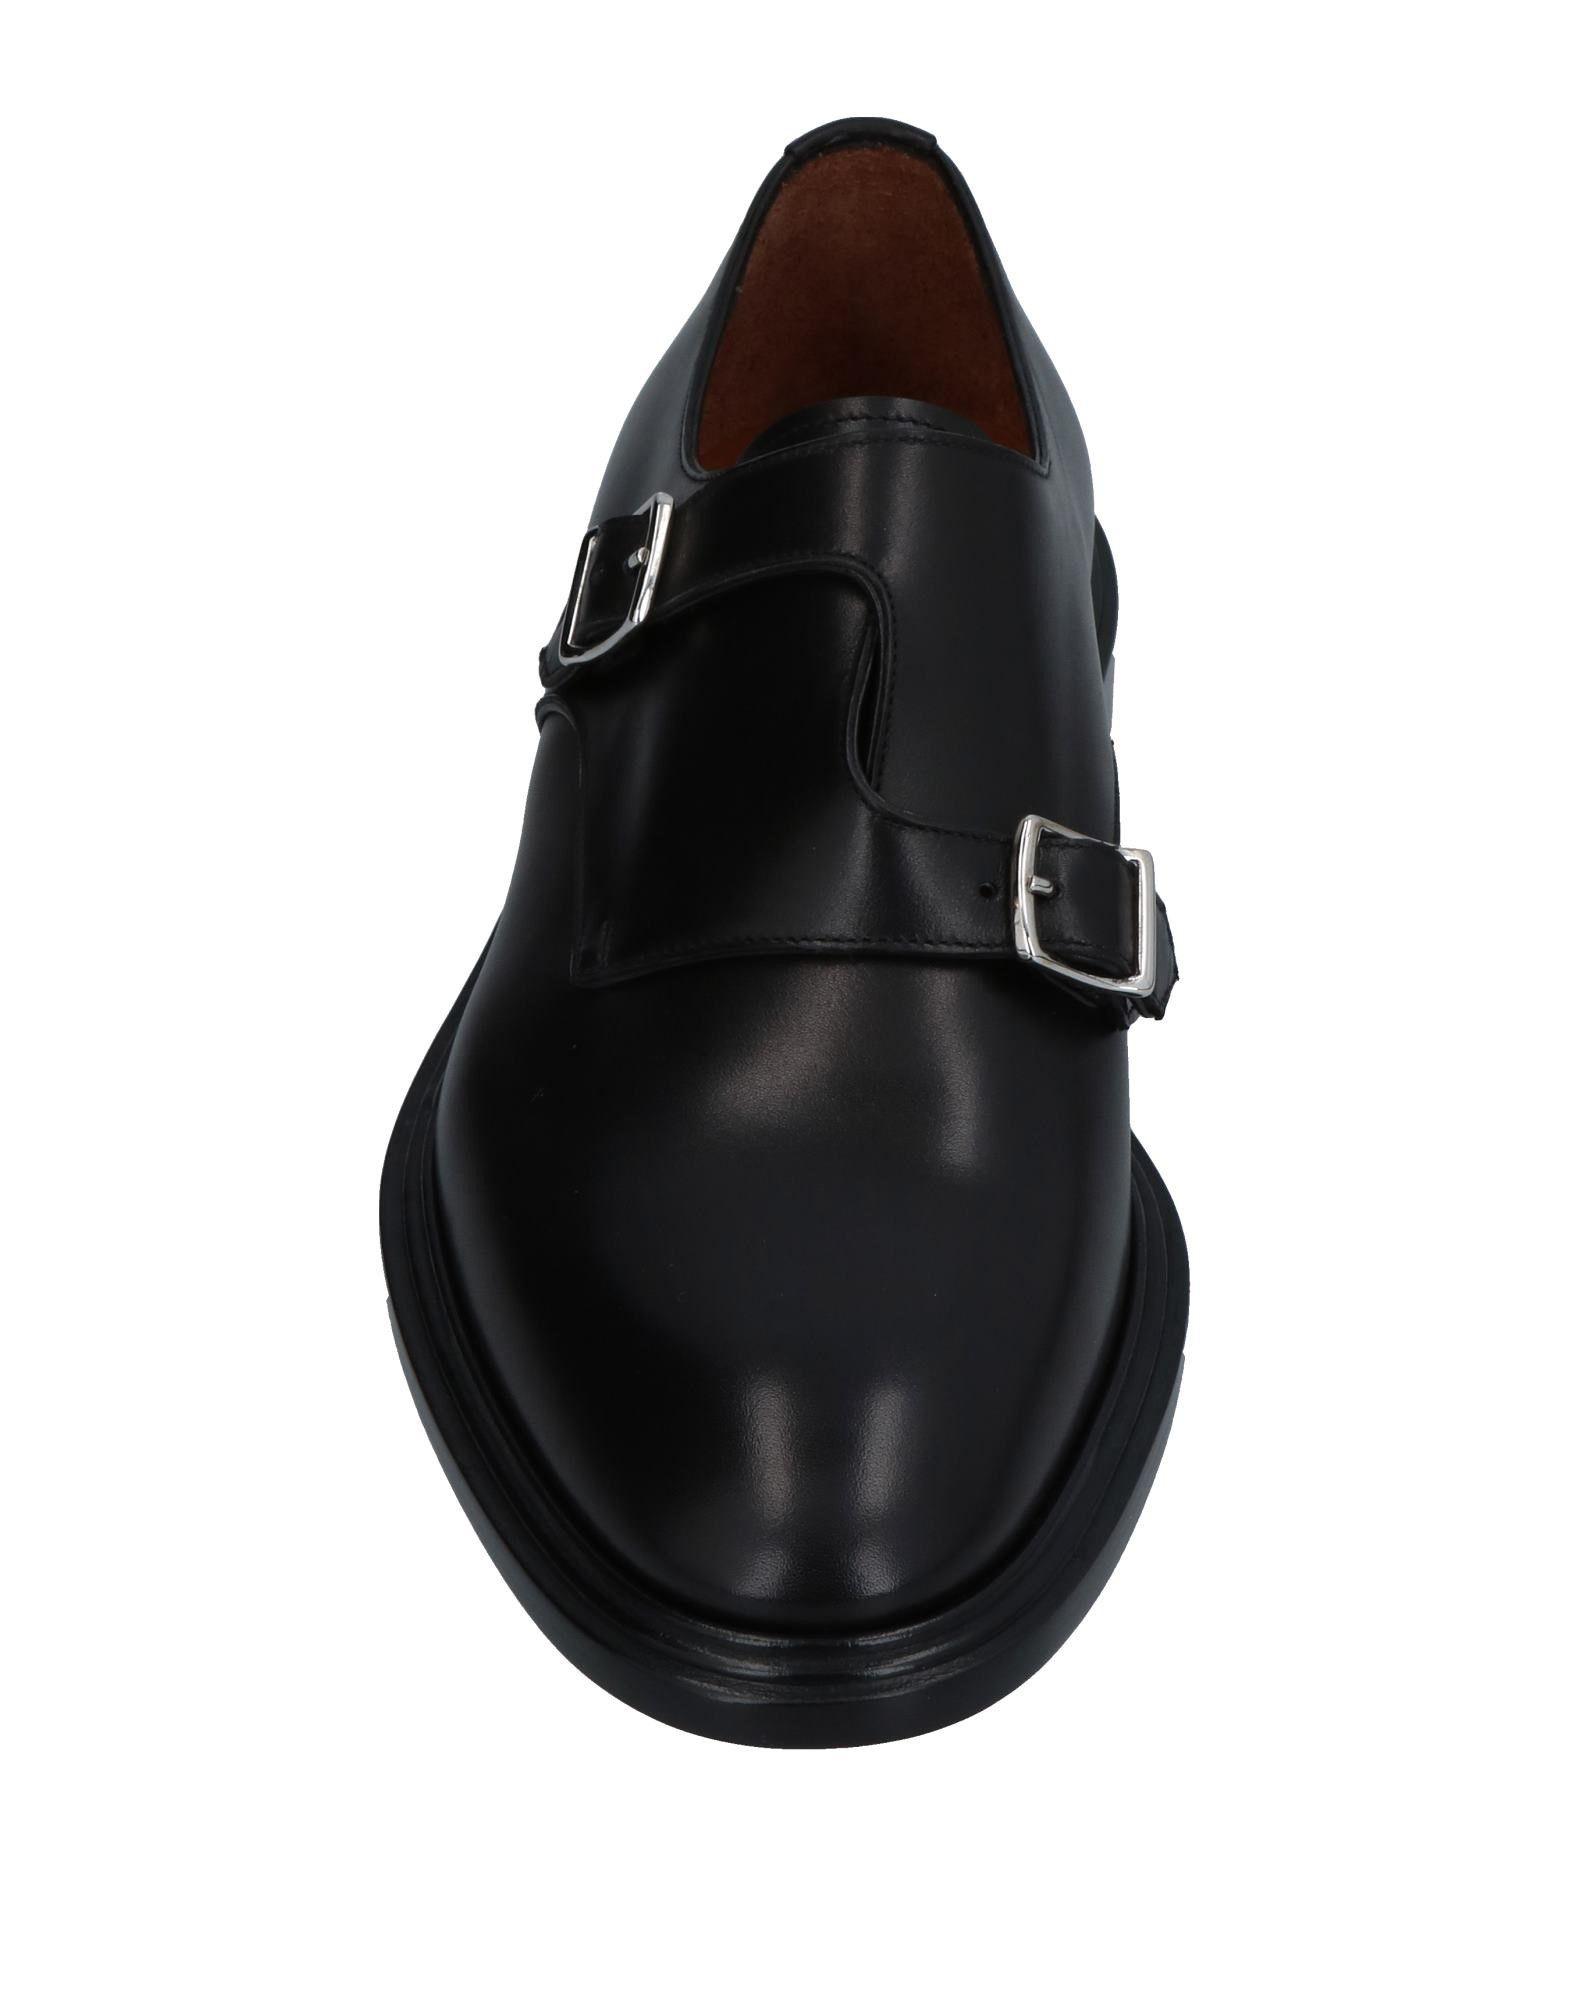 Givenchy Mokassins Herren  11406317DH Gute Qualität beliebte Schuhe